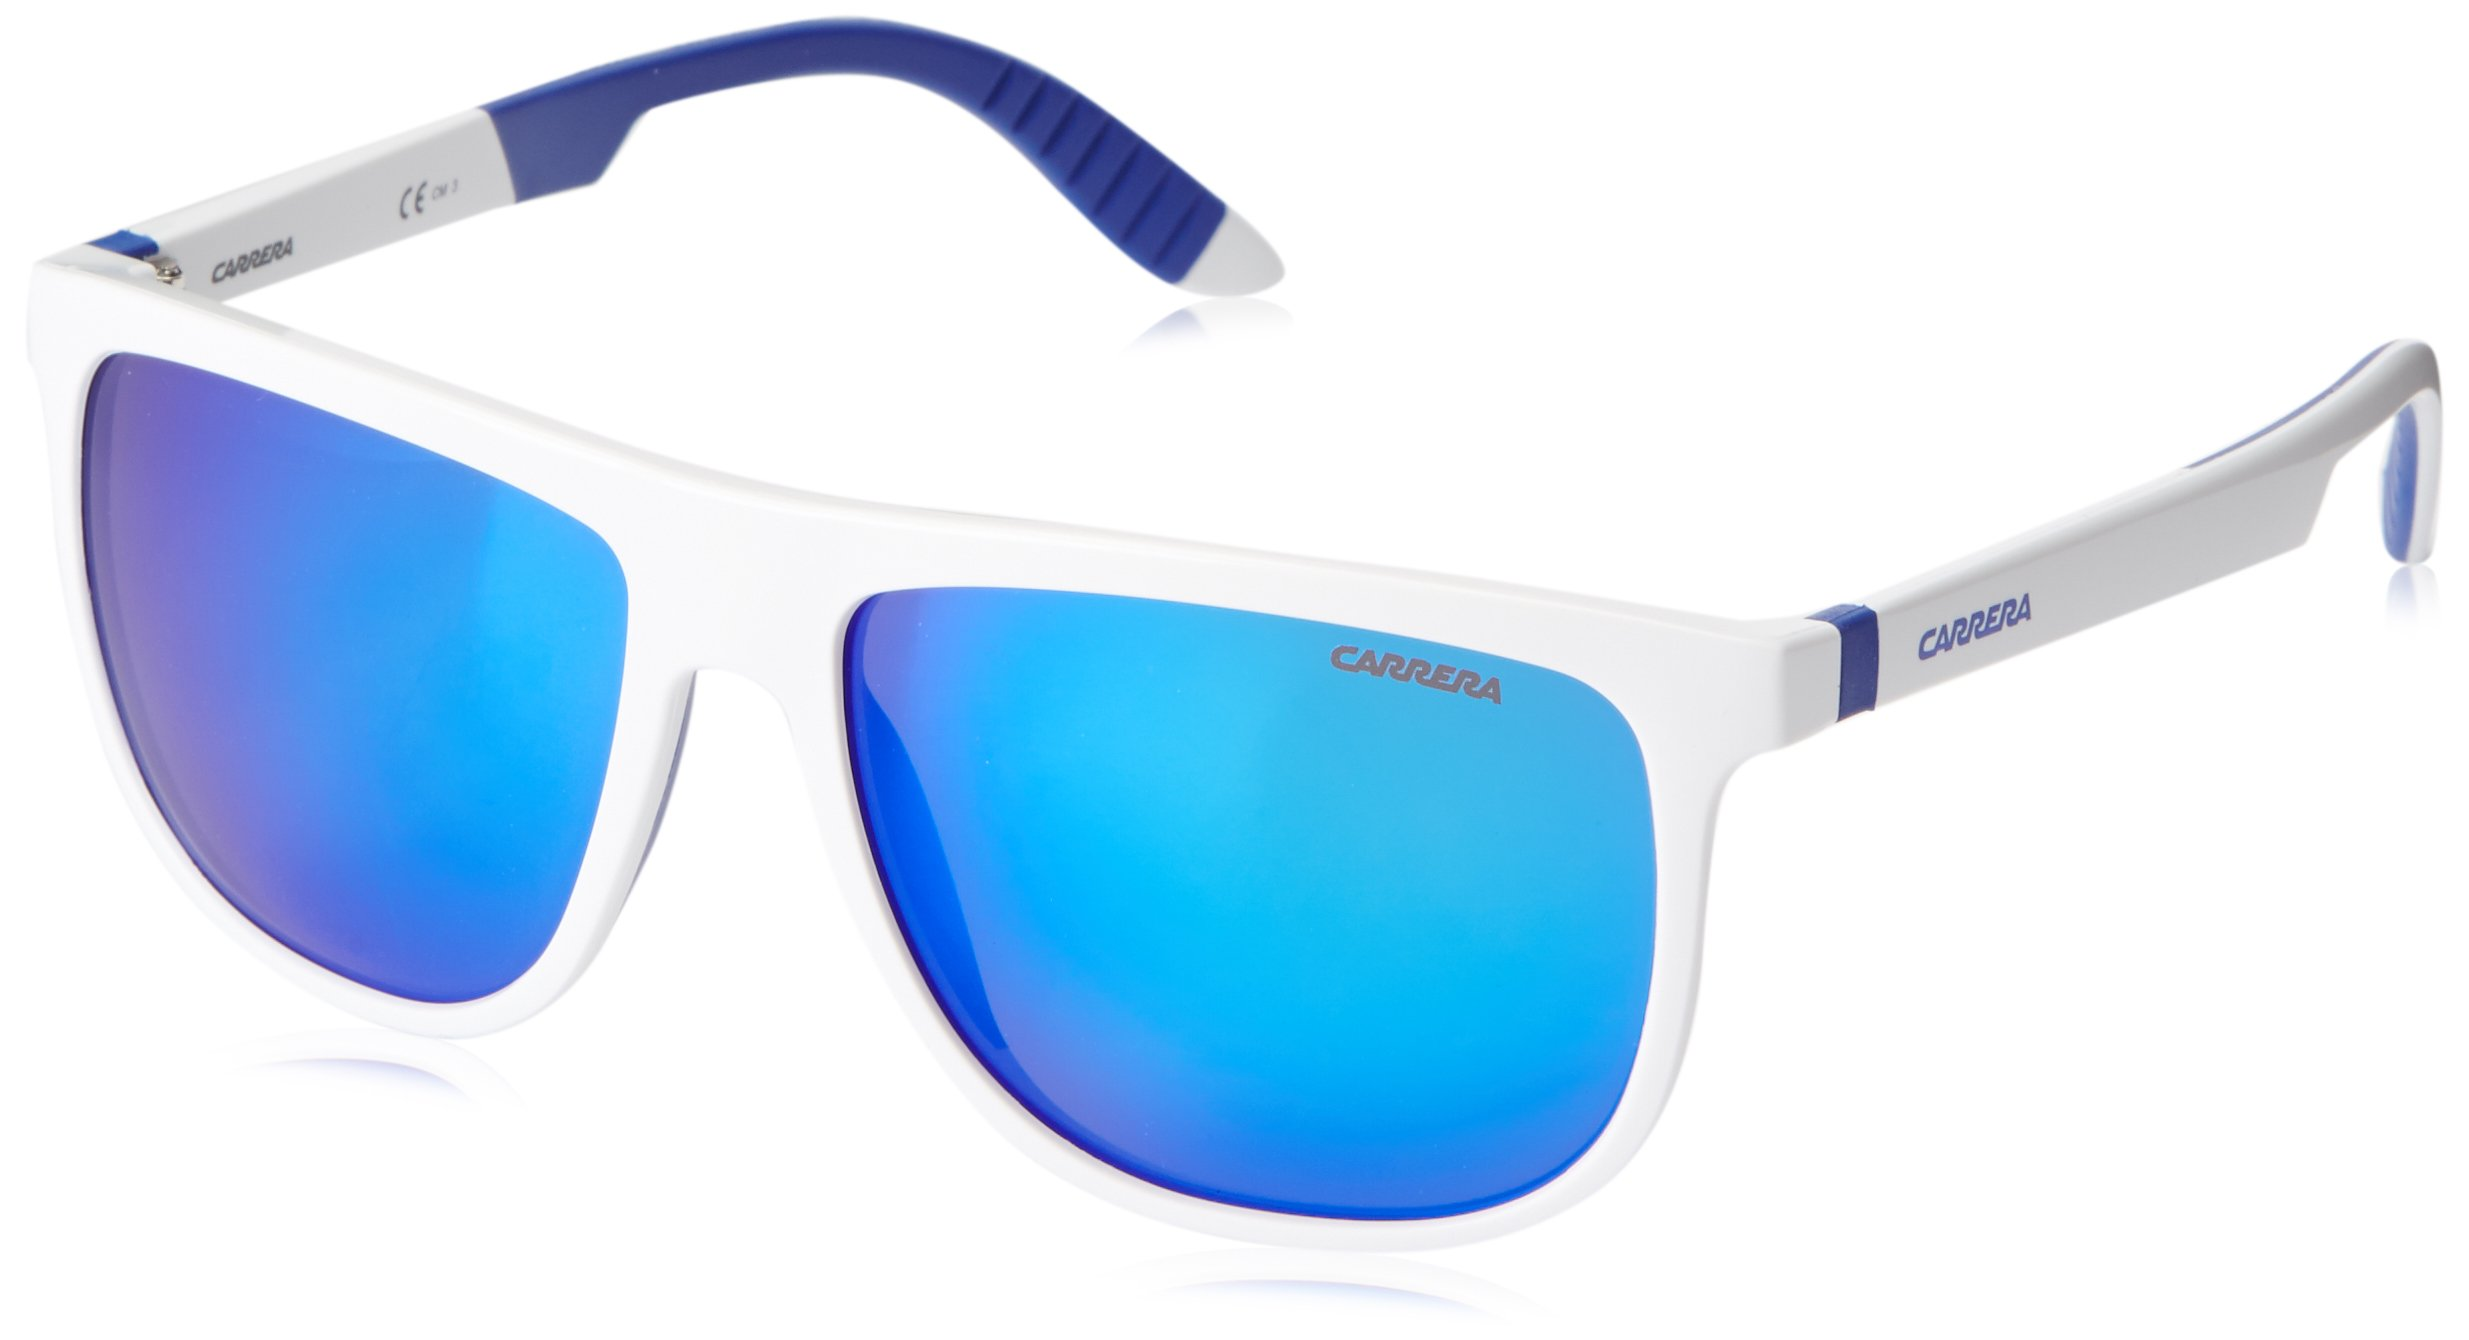 Carrera CA5003SPS Square Sunglasses,White & Blue,58 mm